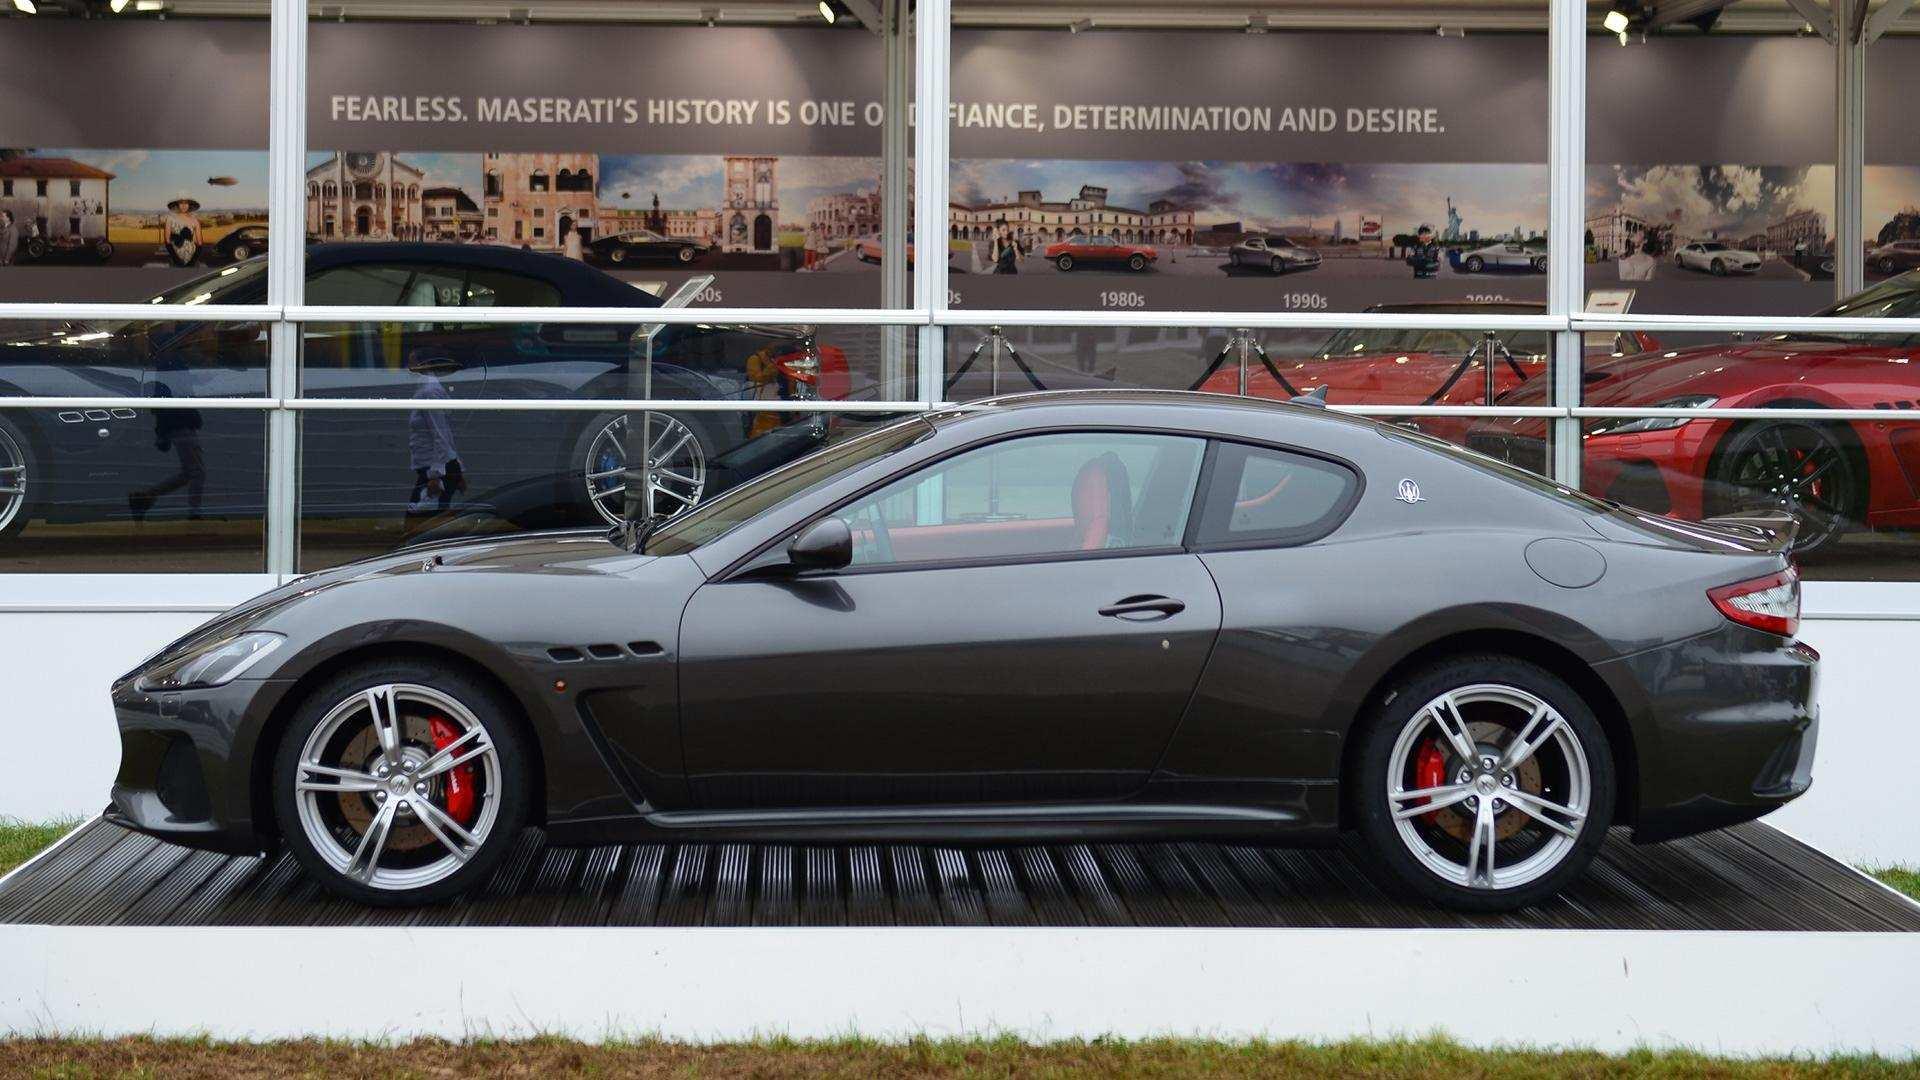 70 All New New Maserati 2020 Specs for New Maserati 2020